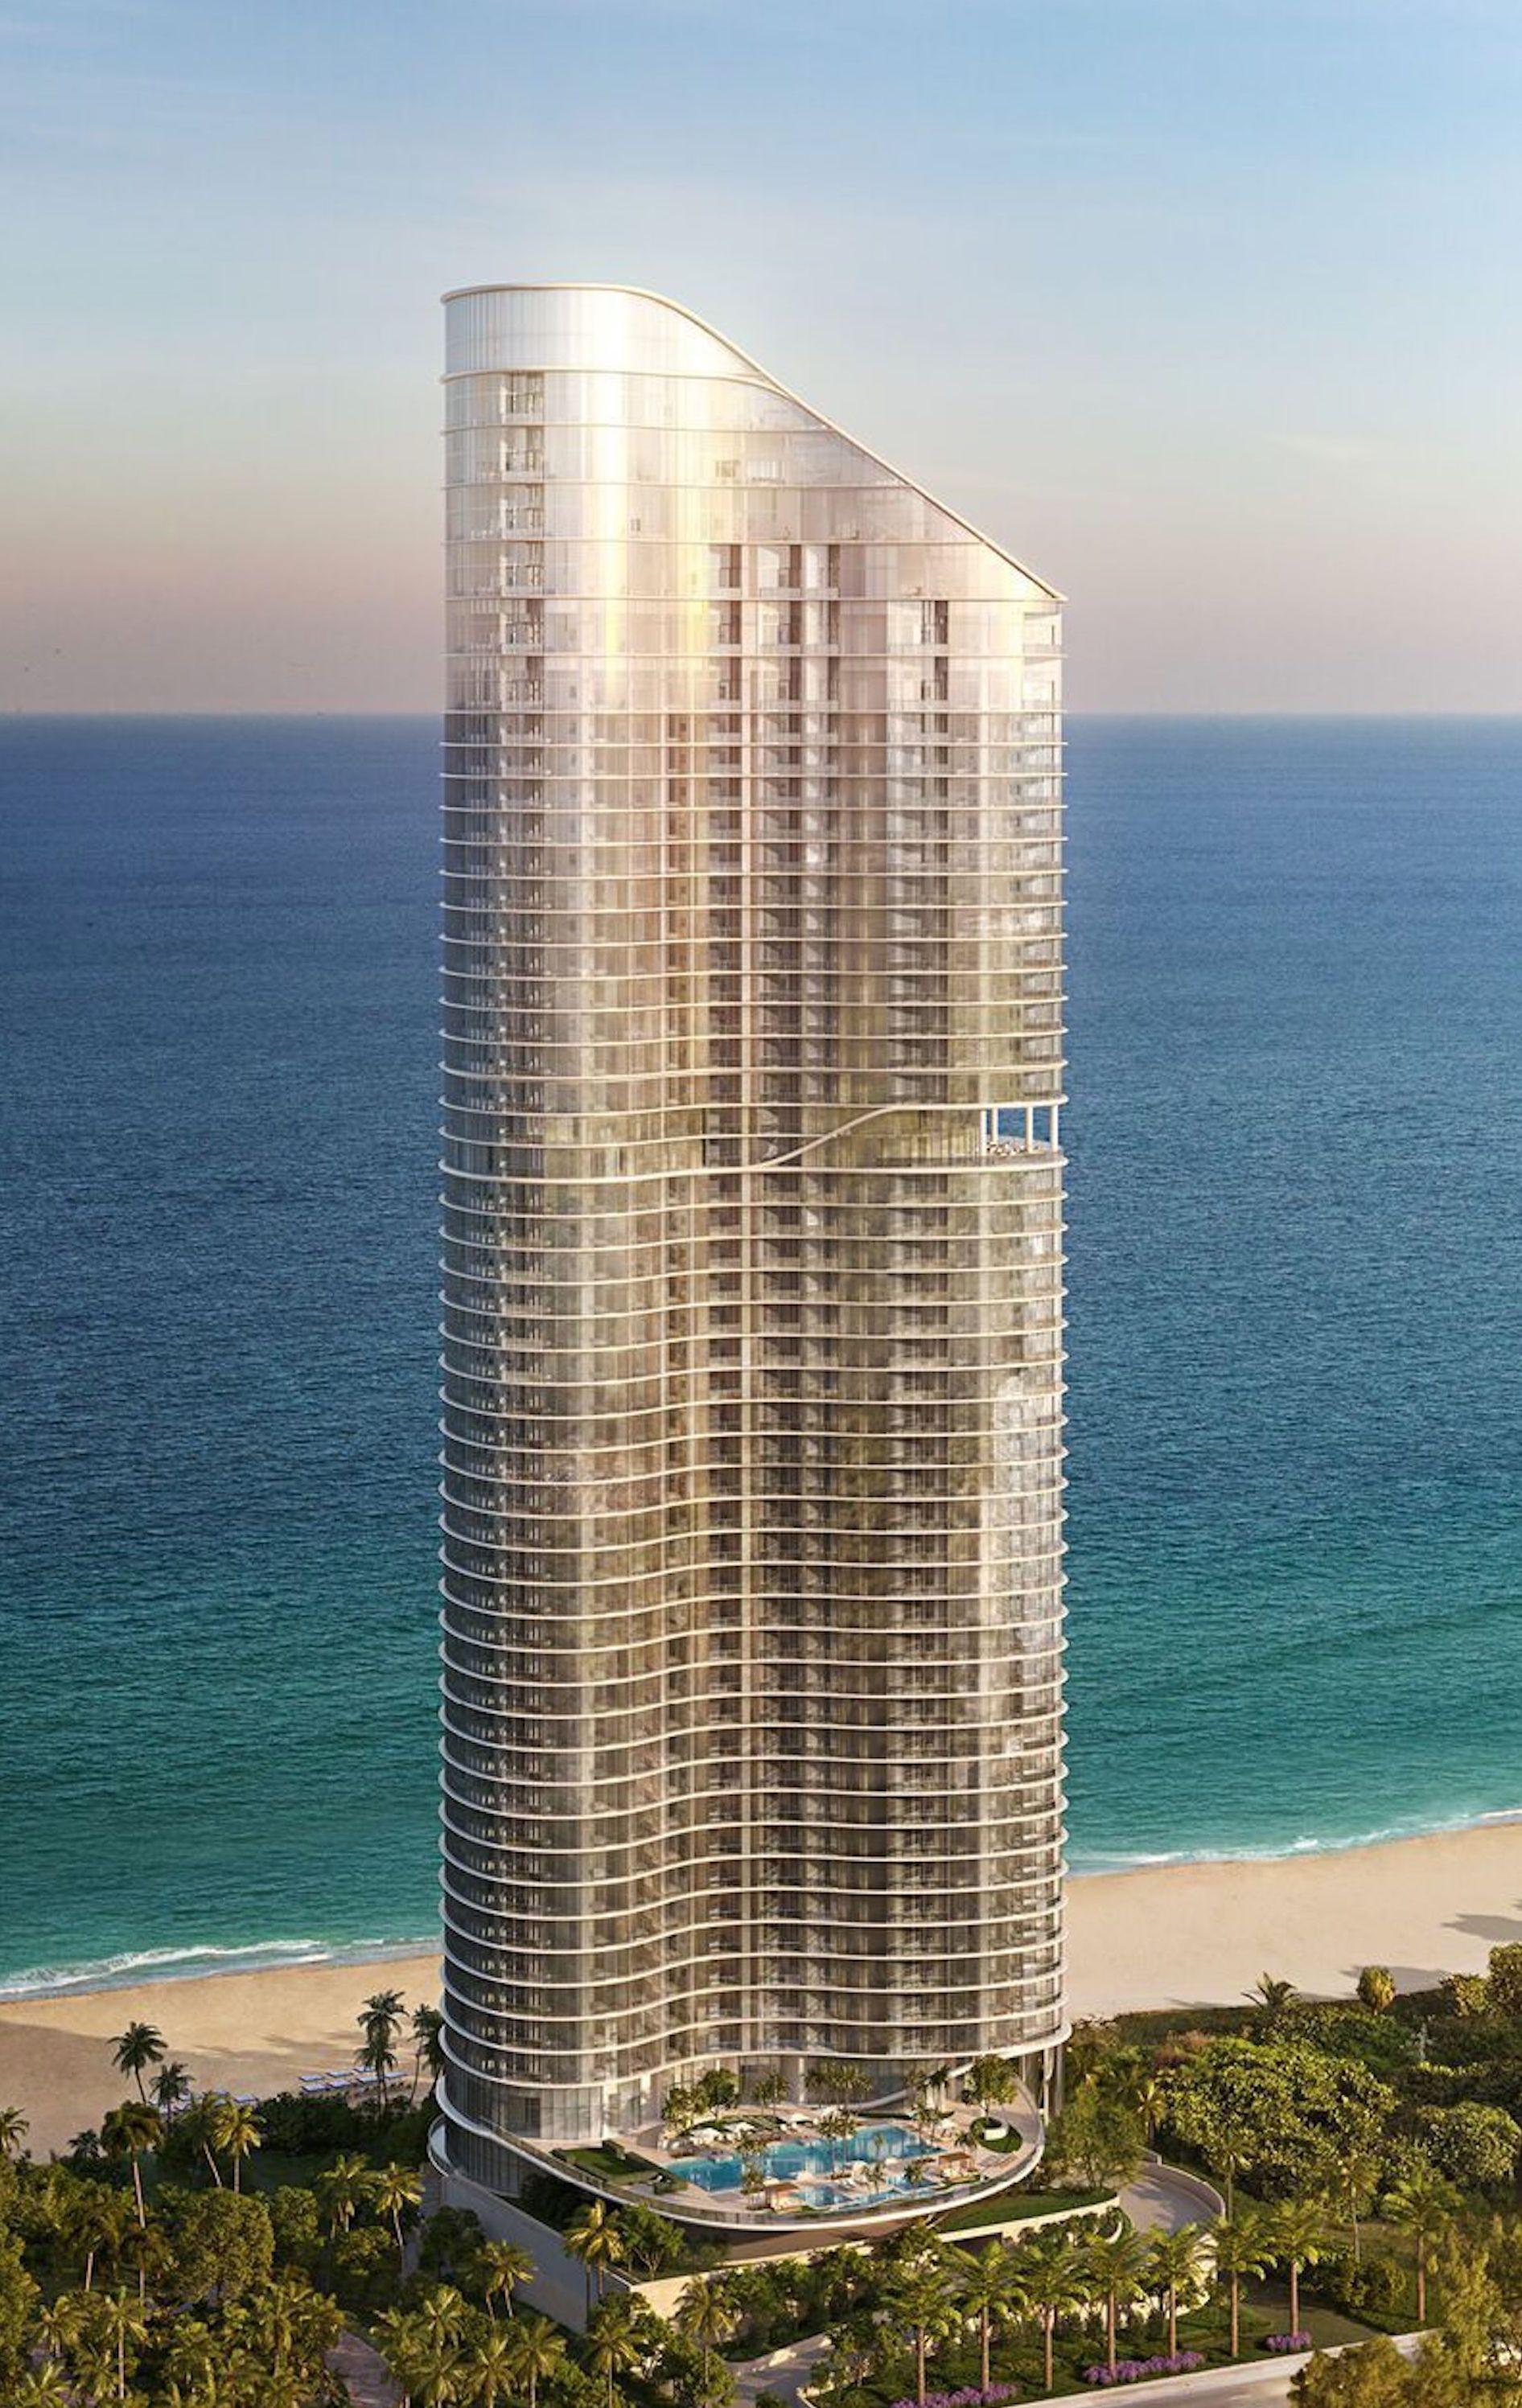 skyview image of Ritz Carlton Sunny Isles